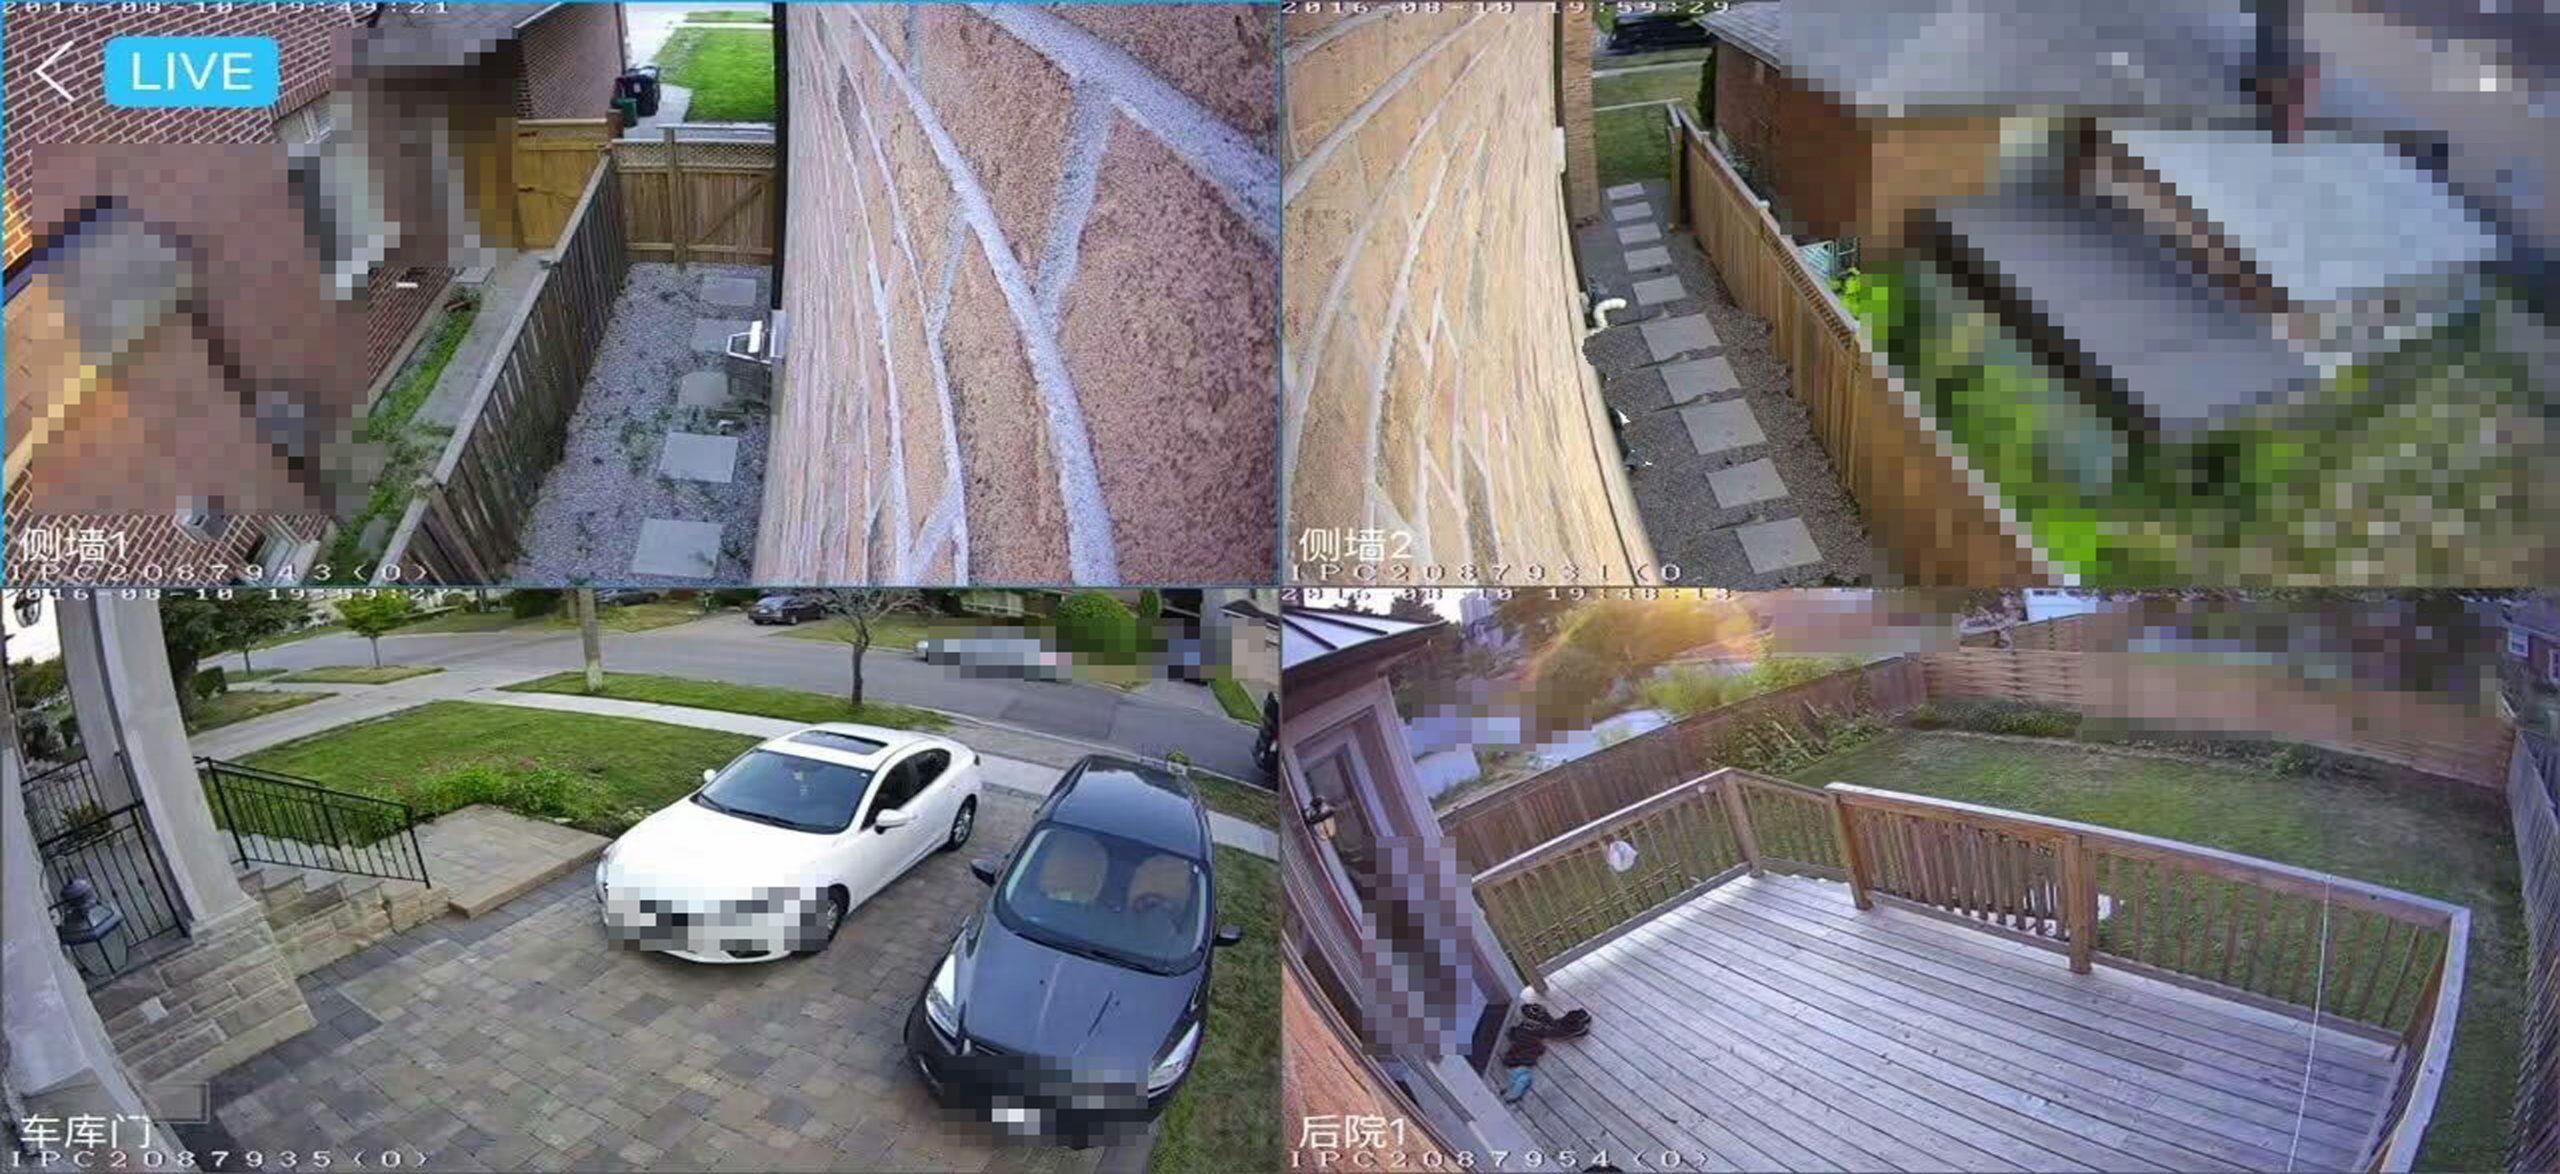 Surveillance Installation for 5000sqft Mansion